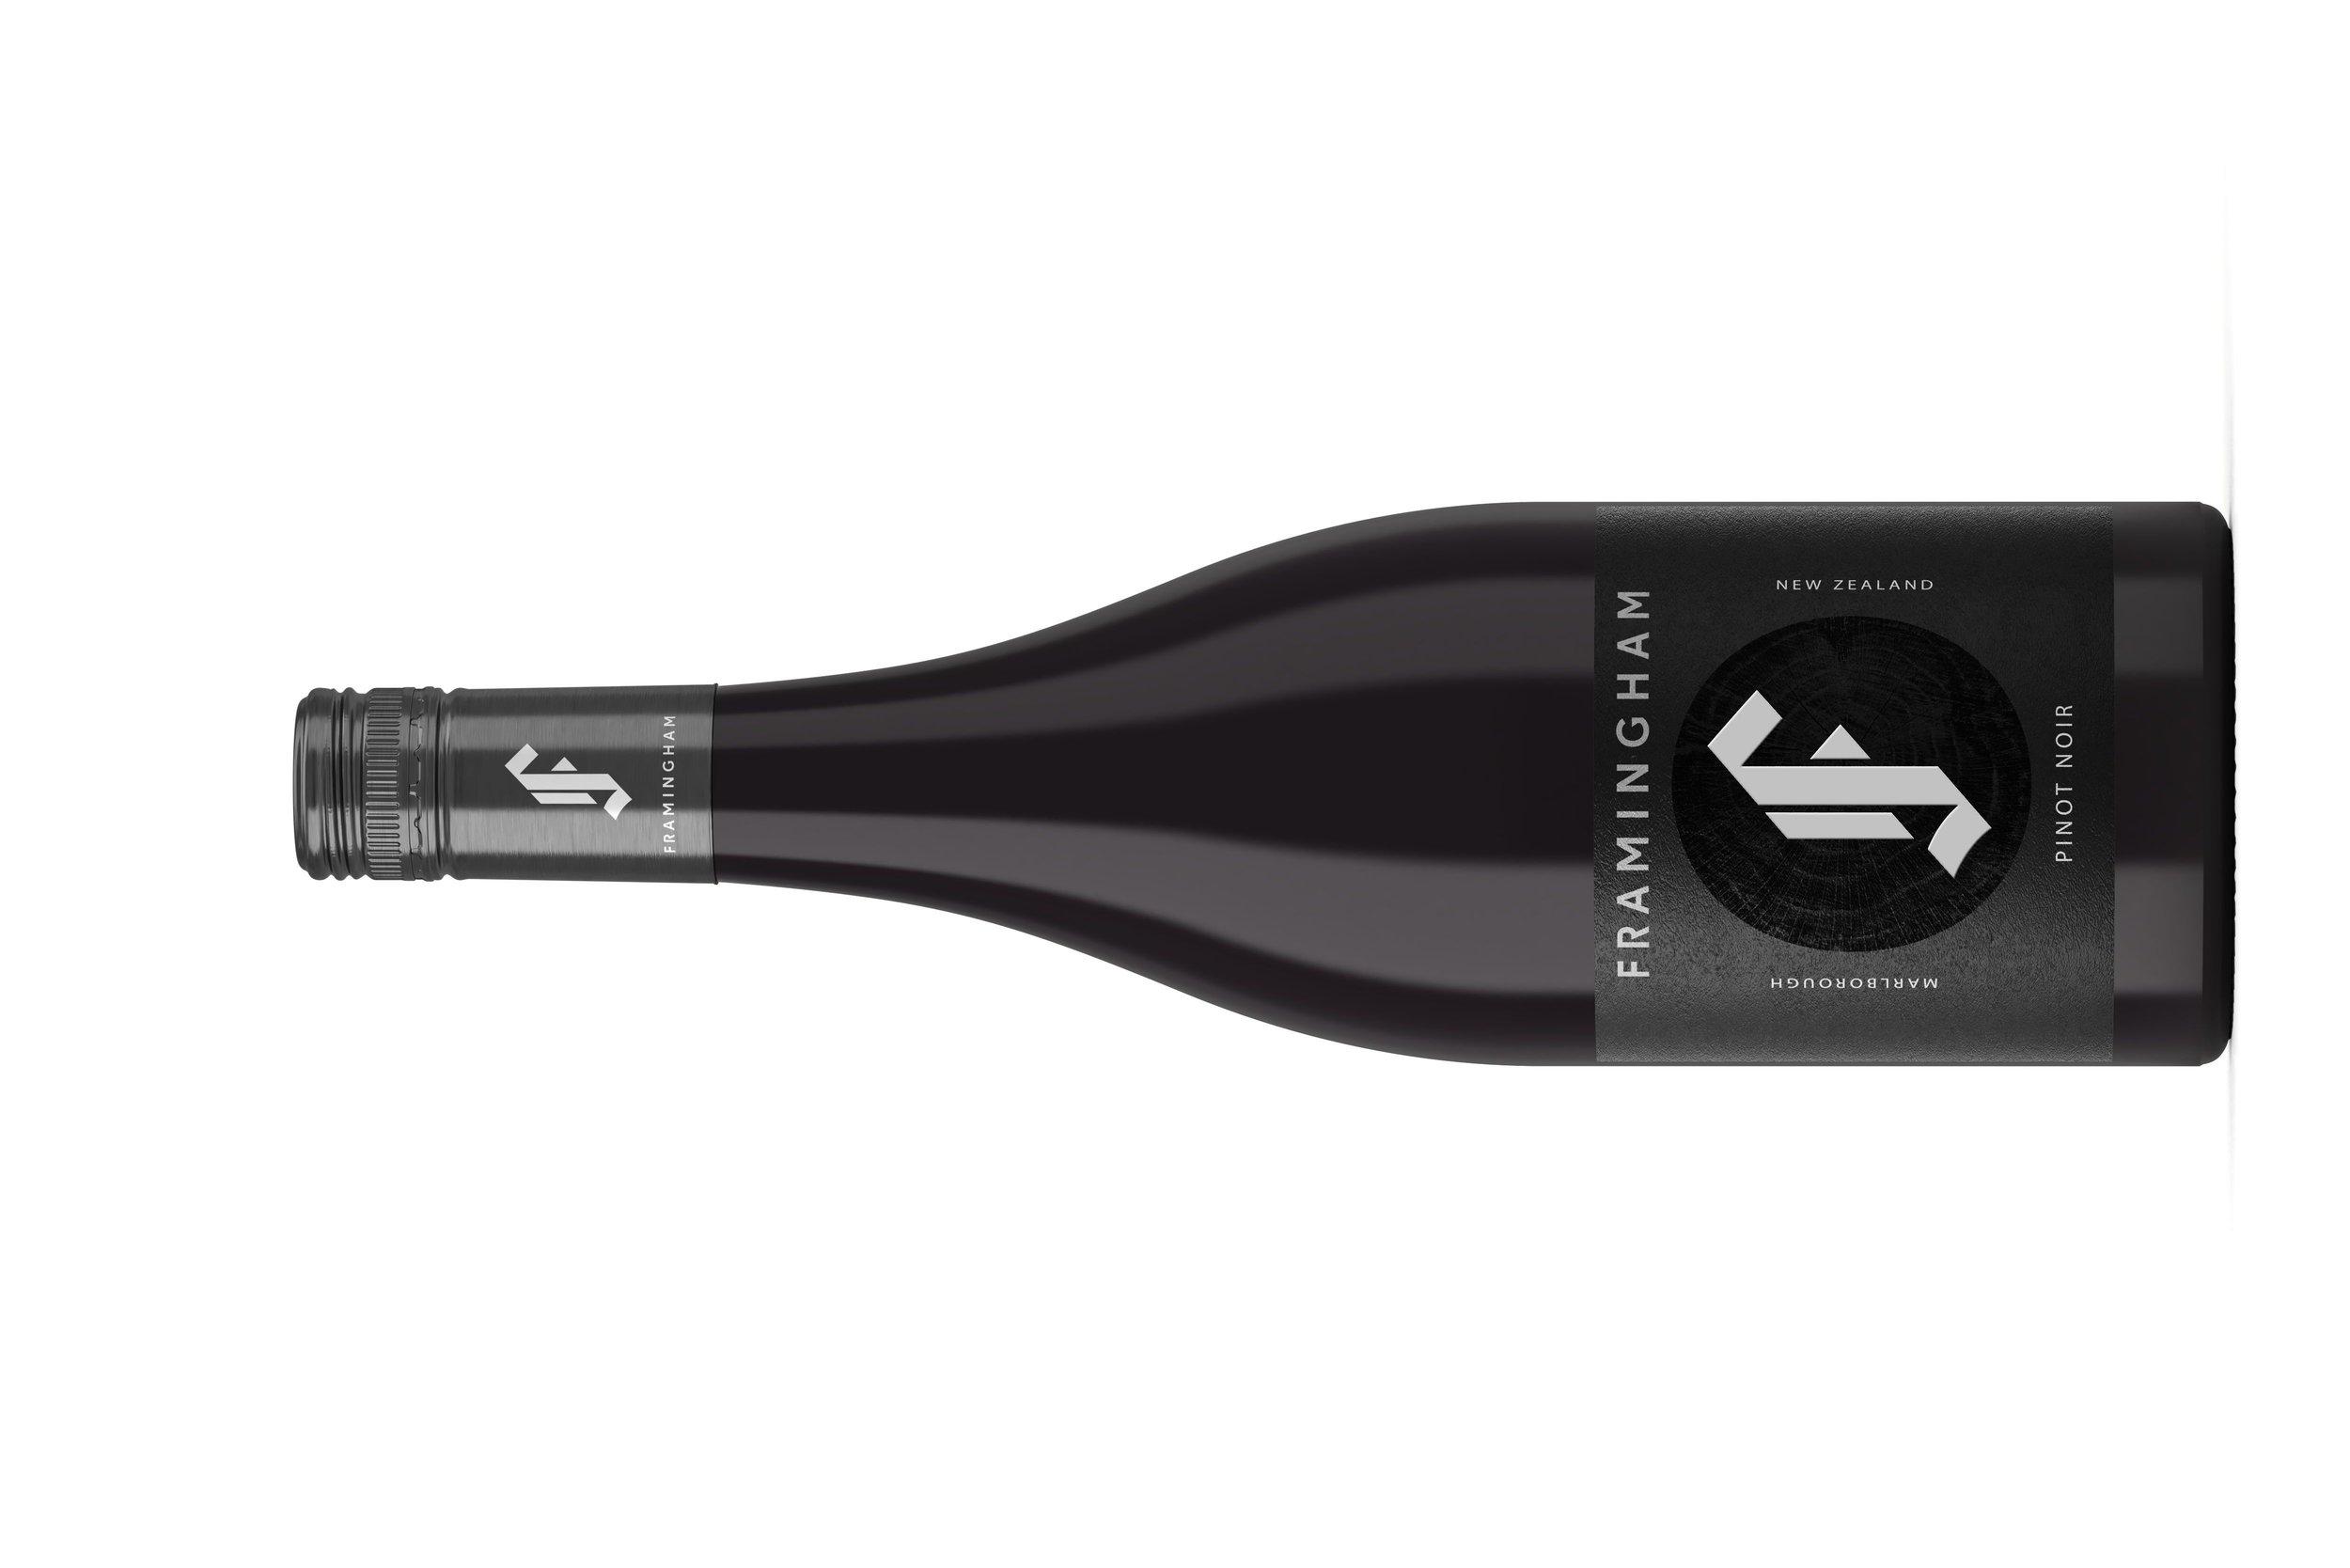 Framingham Pinot Noir    フラミンガム ピノノワール   原産地: マールボロ  希望小売価格: ¥5,100, 750ml, 2017, 13%  やさしくスパイシーなオークの影響を受けた、イチゴと野さくらんぼの印象的な透明感。 口あたりは、トゲのあるような赤系の果物のニュアンスとともに、軽いペッパーが芯にあり、余韻は長くフレッシュ。飲み頃ですが、 少し熟成させても良いでしょう。 スクリューキャップ。  Impressive clarity of strawberries and wild cherries, amid some gently spicy oak influence. The palate has a lightly peppery core with a brambly red-fruit thread that holds long and fresh. Drink or hold. Screw cap.